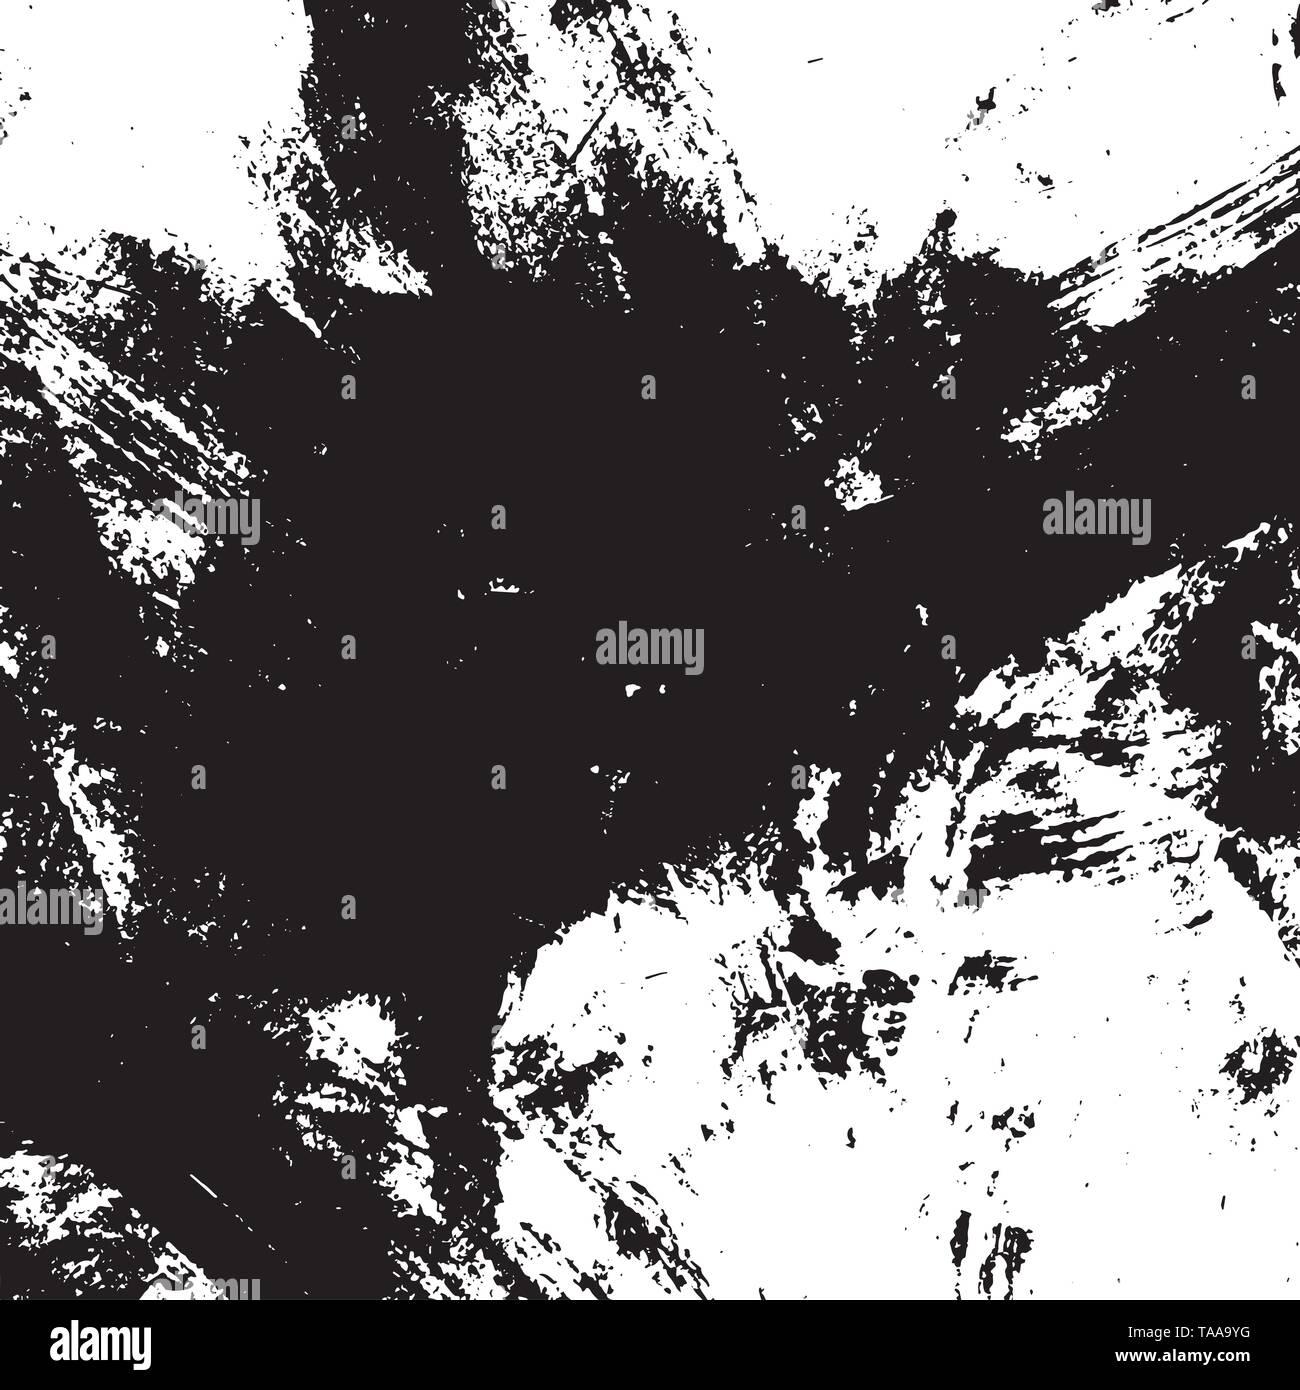 Distress Overlay Texture - Stock Image